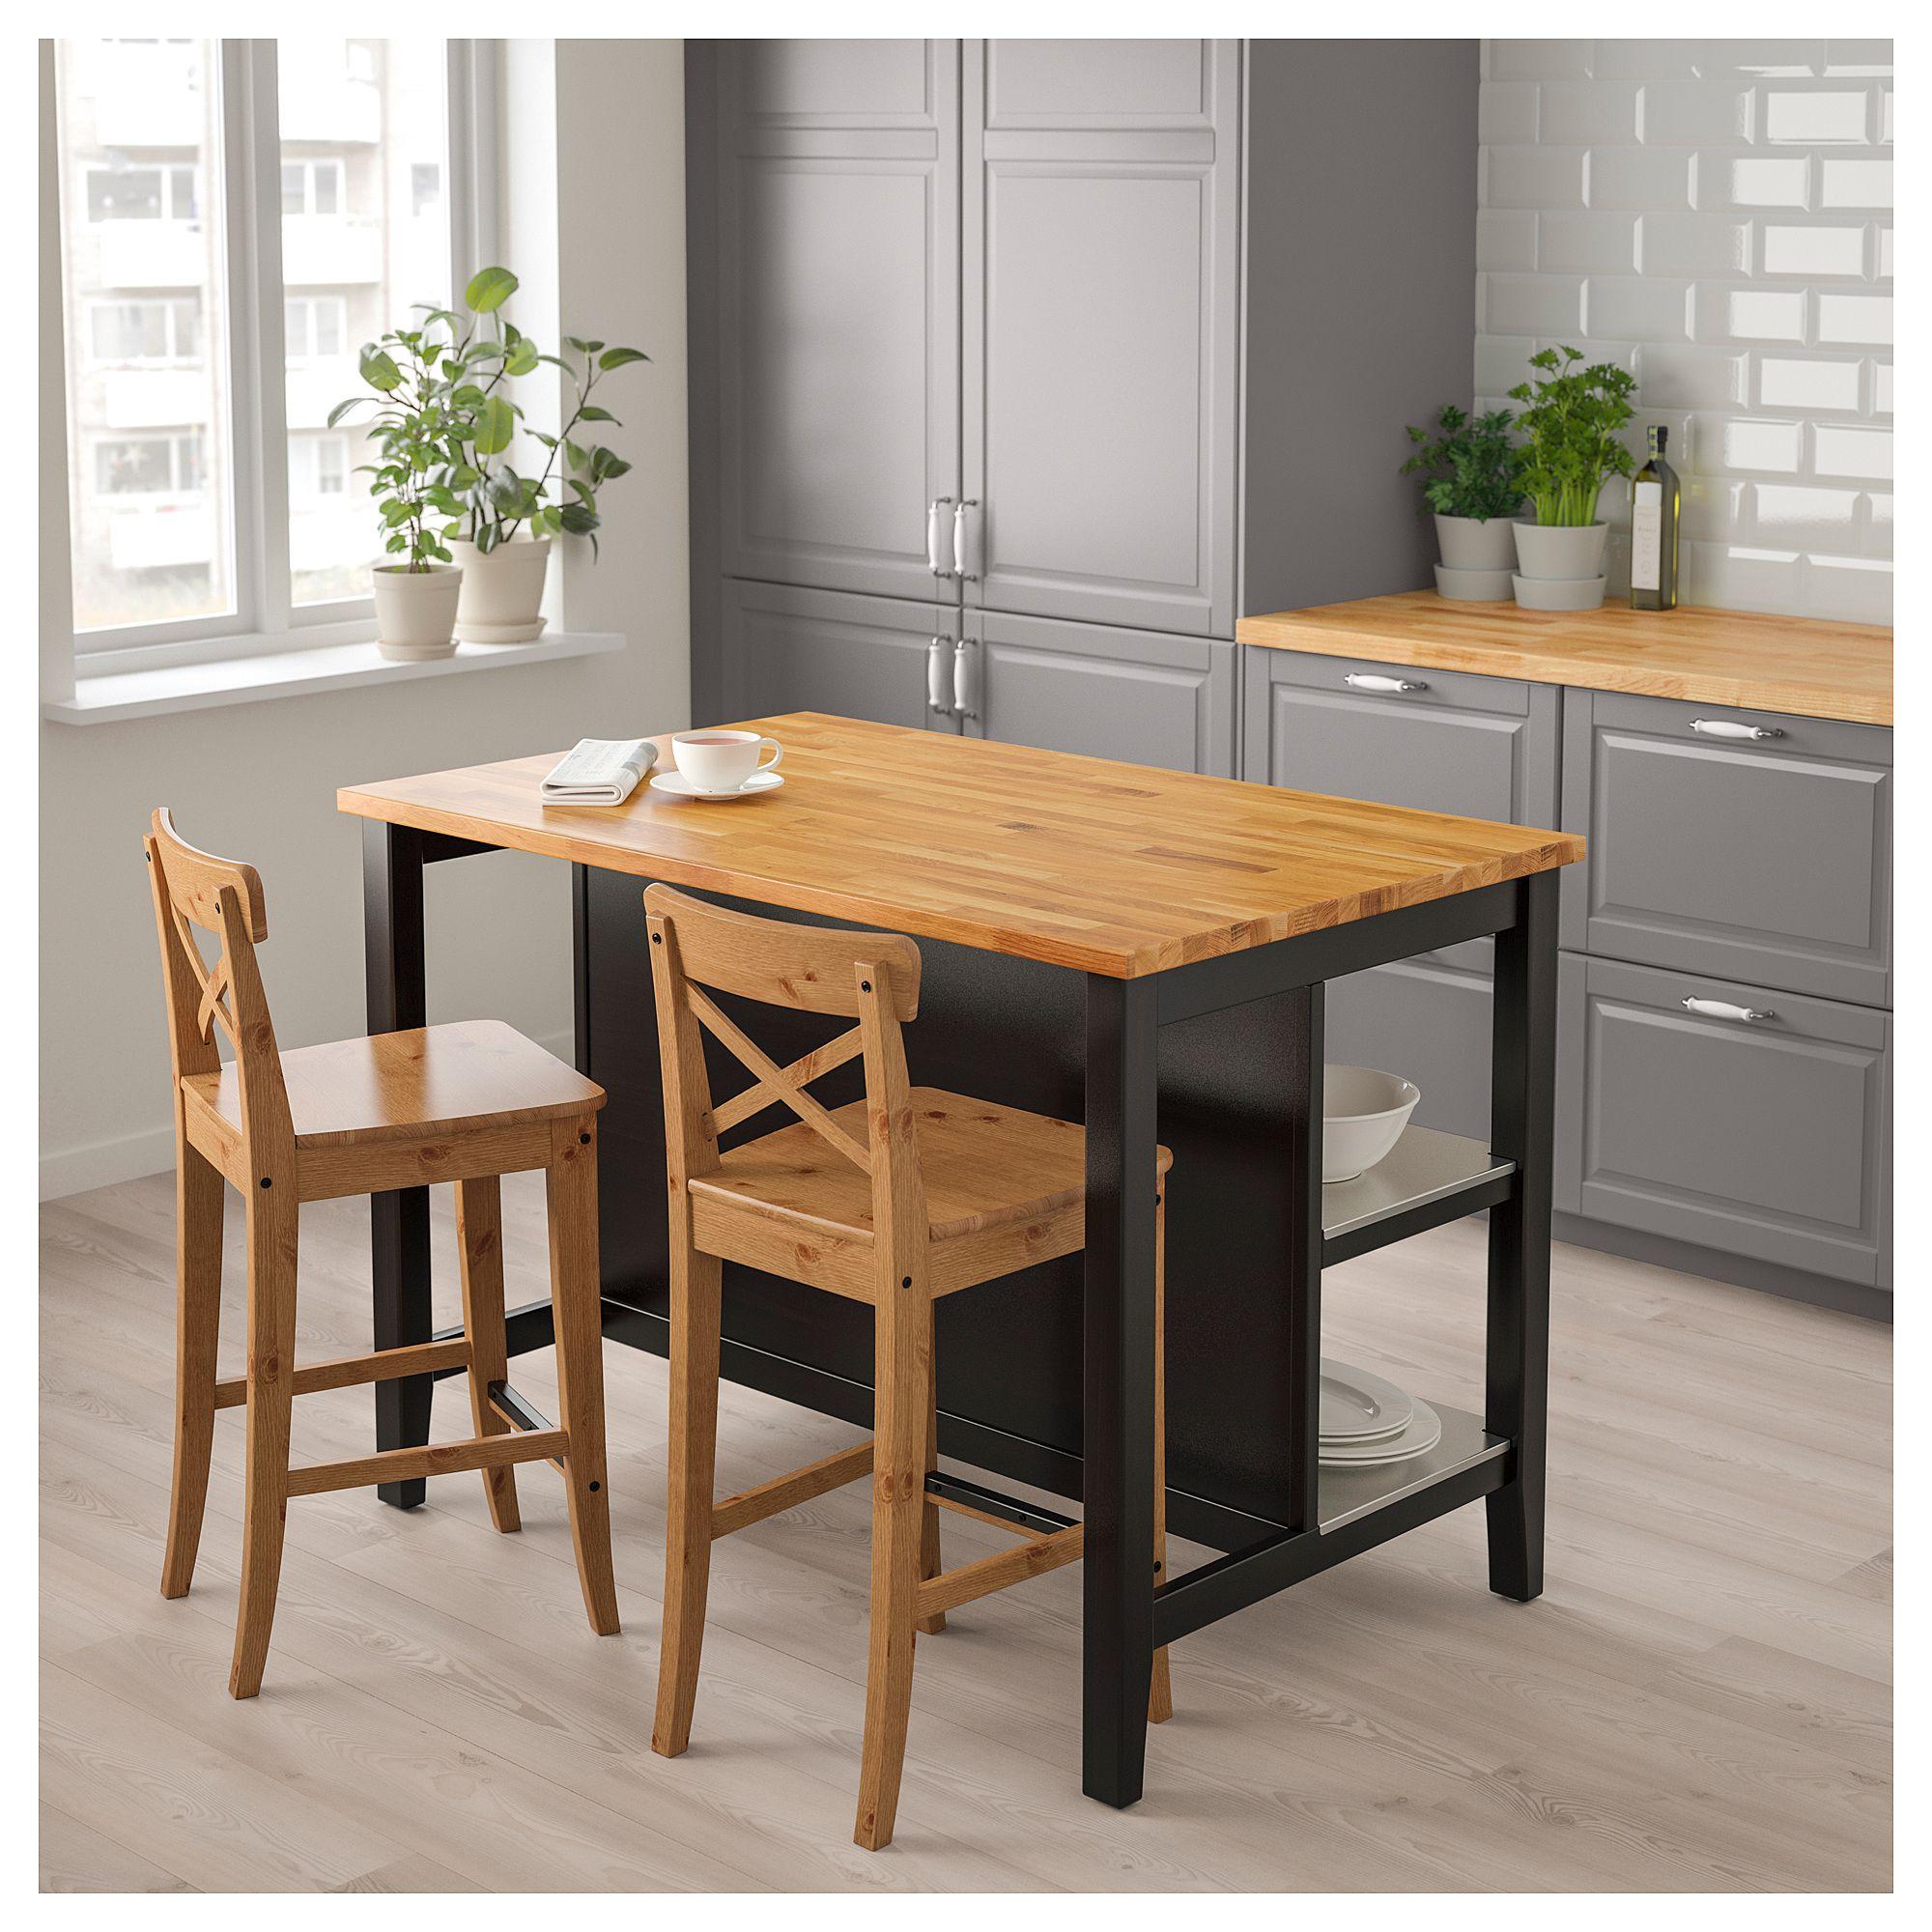 ikea stenstorp kitchen island black brown oak